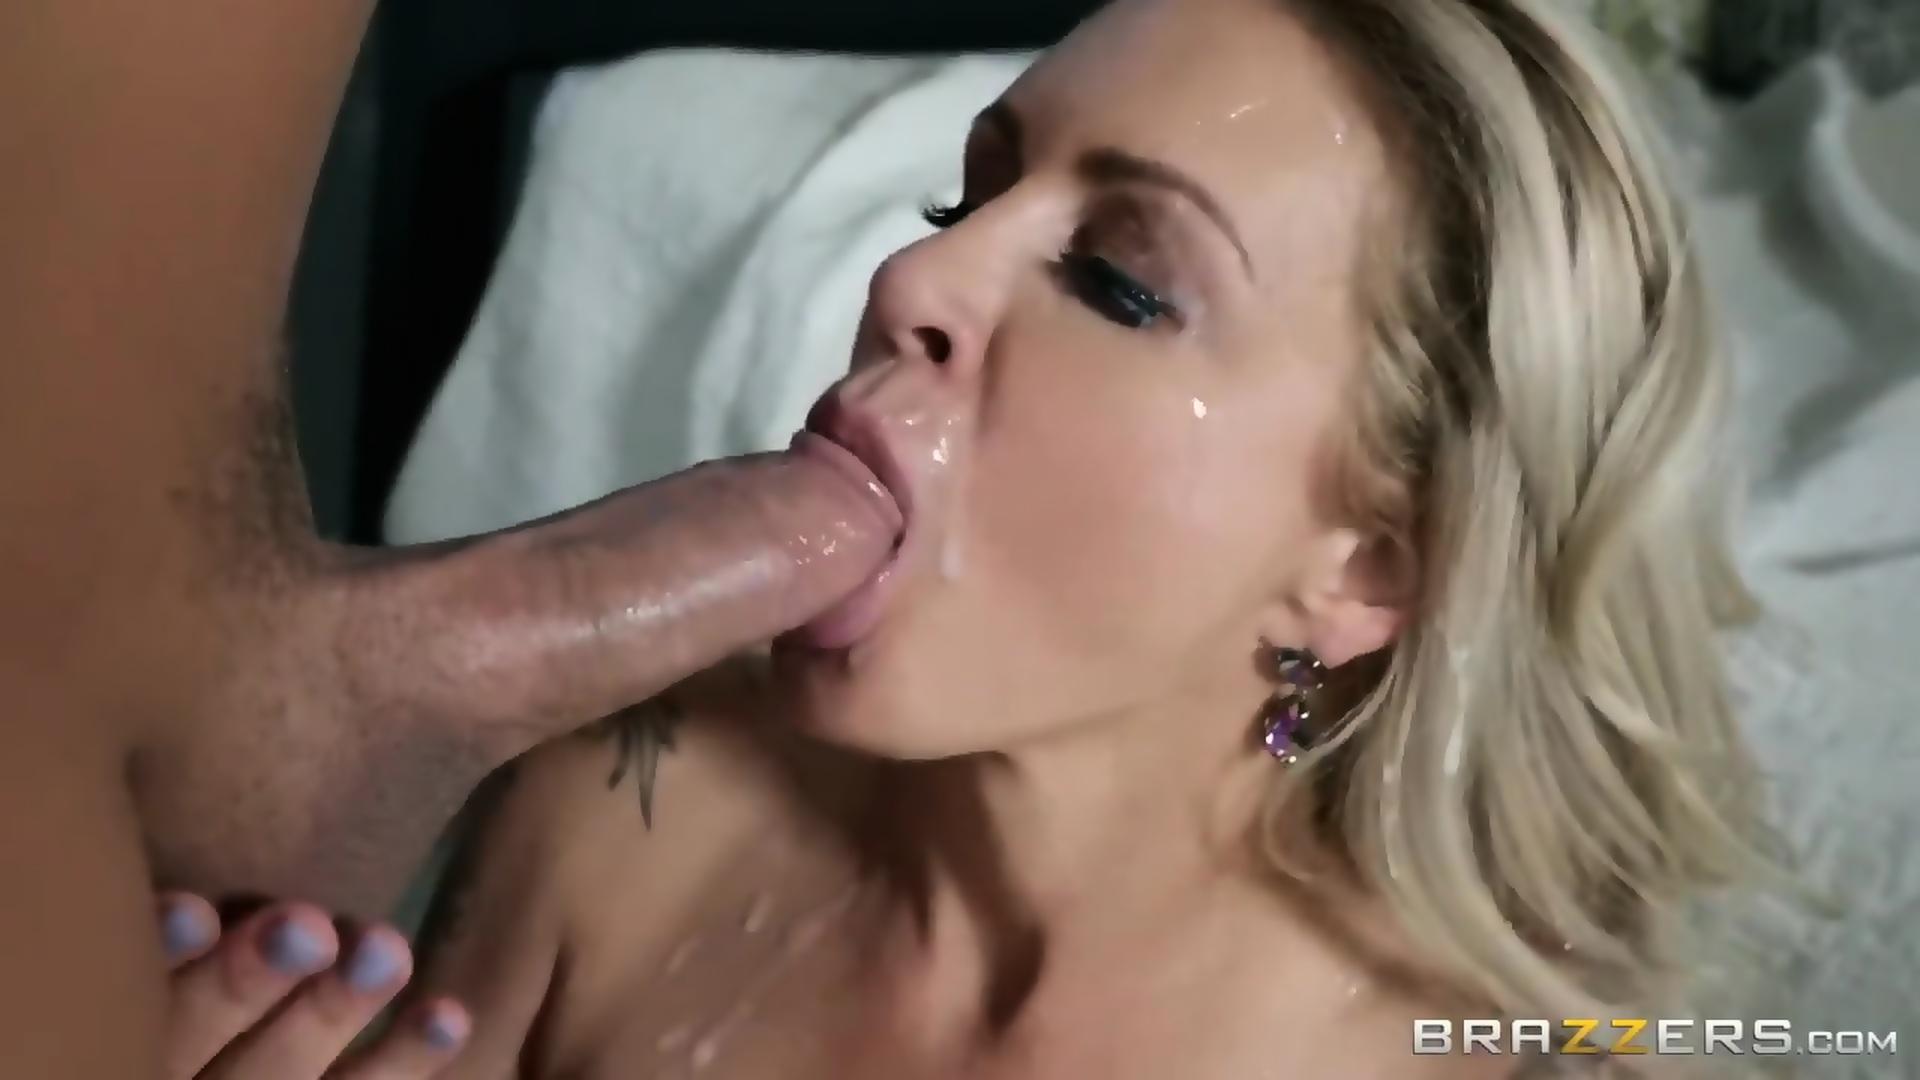 Hot Girlfriend Gives Blowjob